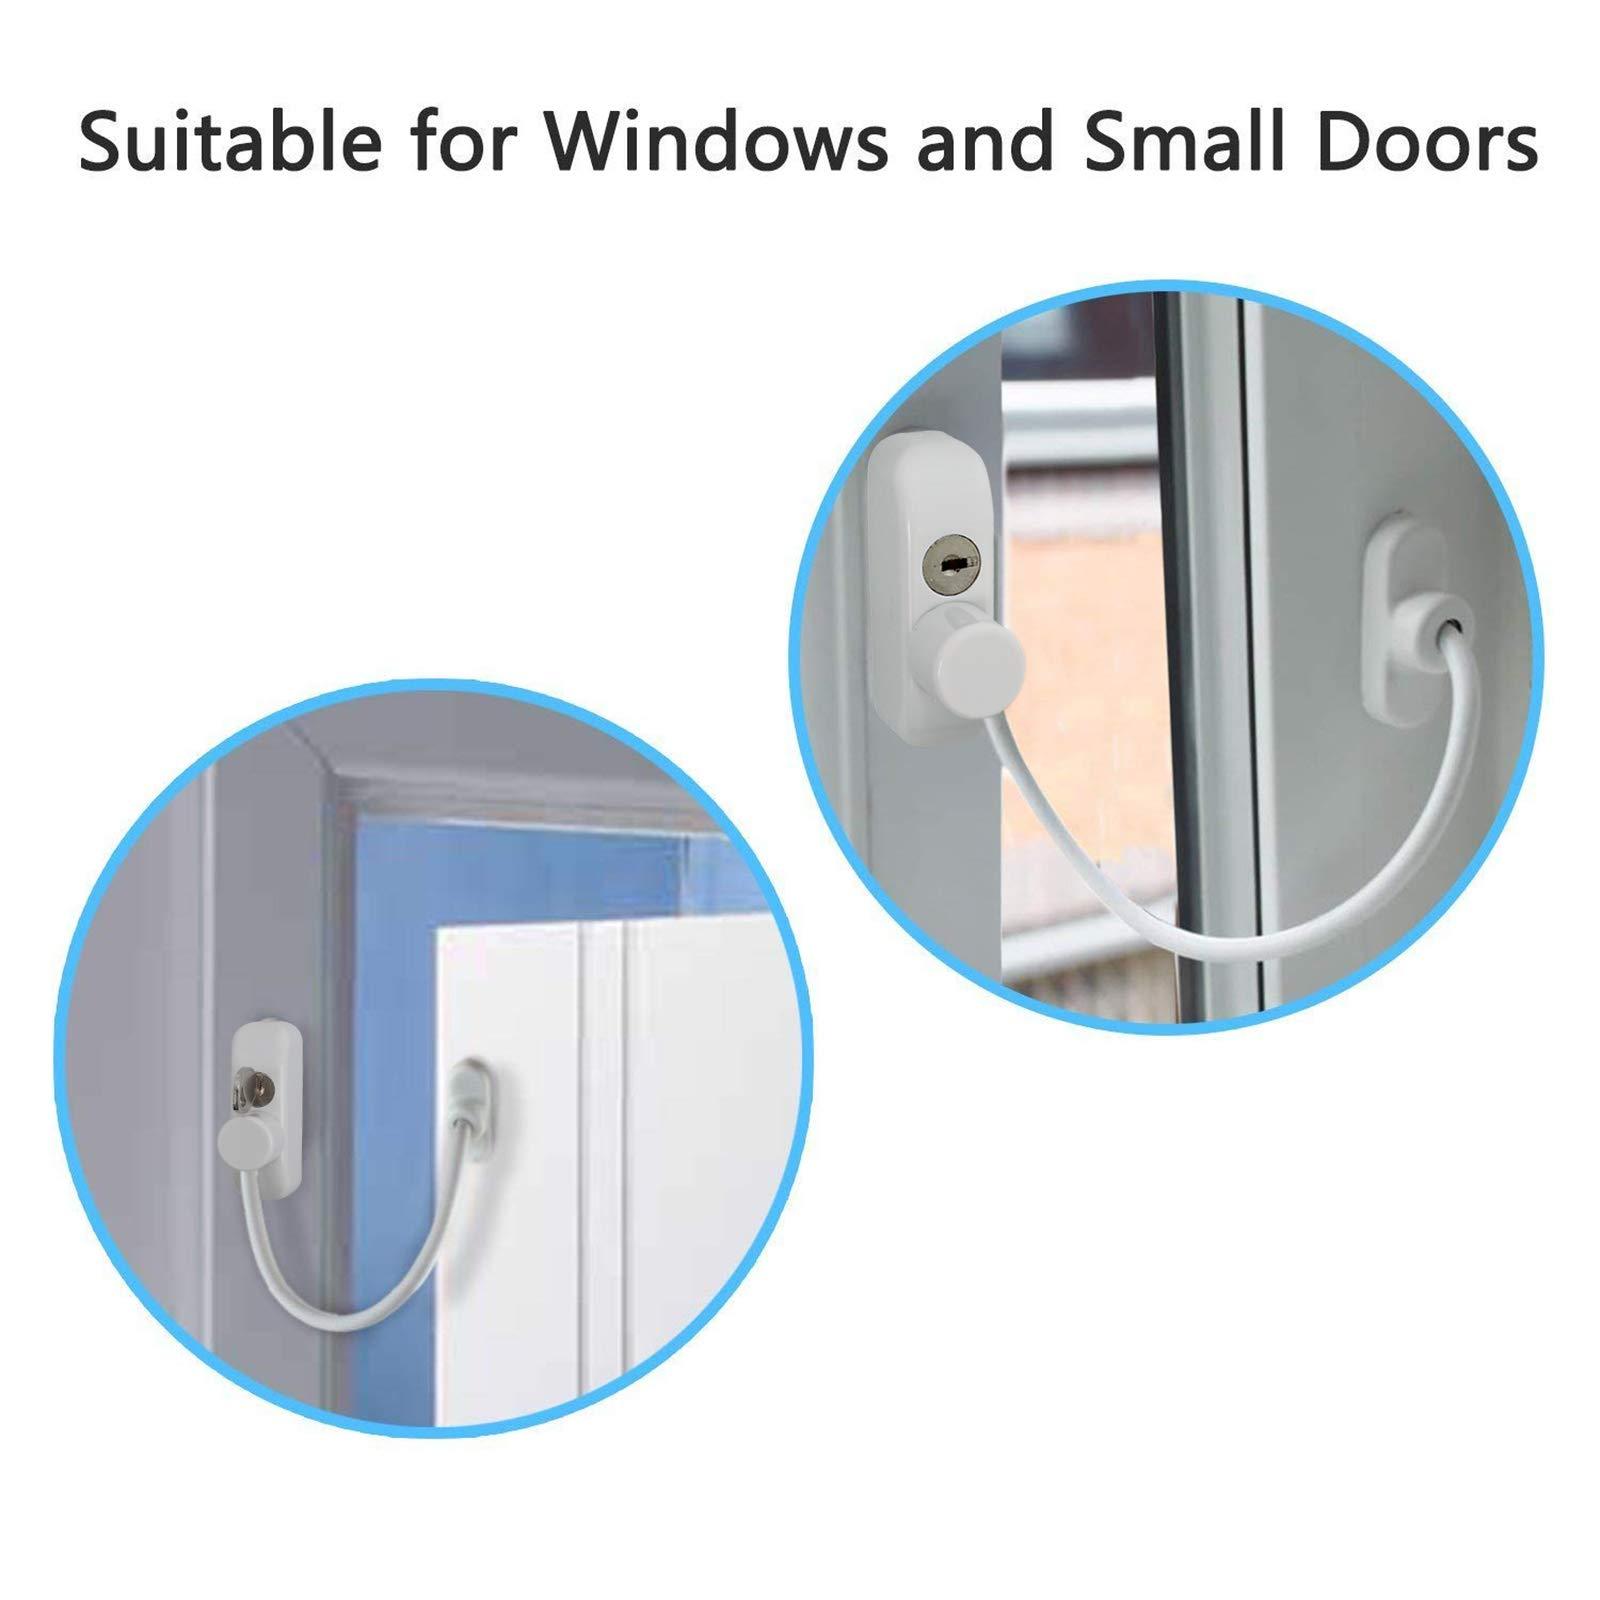 Kamtop Window Restrictor Locks 8 Packs Security Cable for Child Baby Safety Window Locks Door Locks with Screws Keys by Kamtop (Image #5)